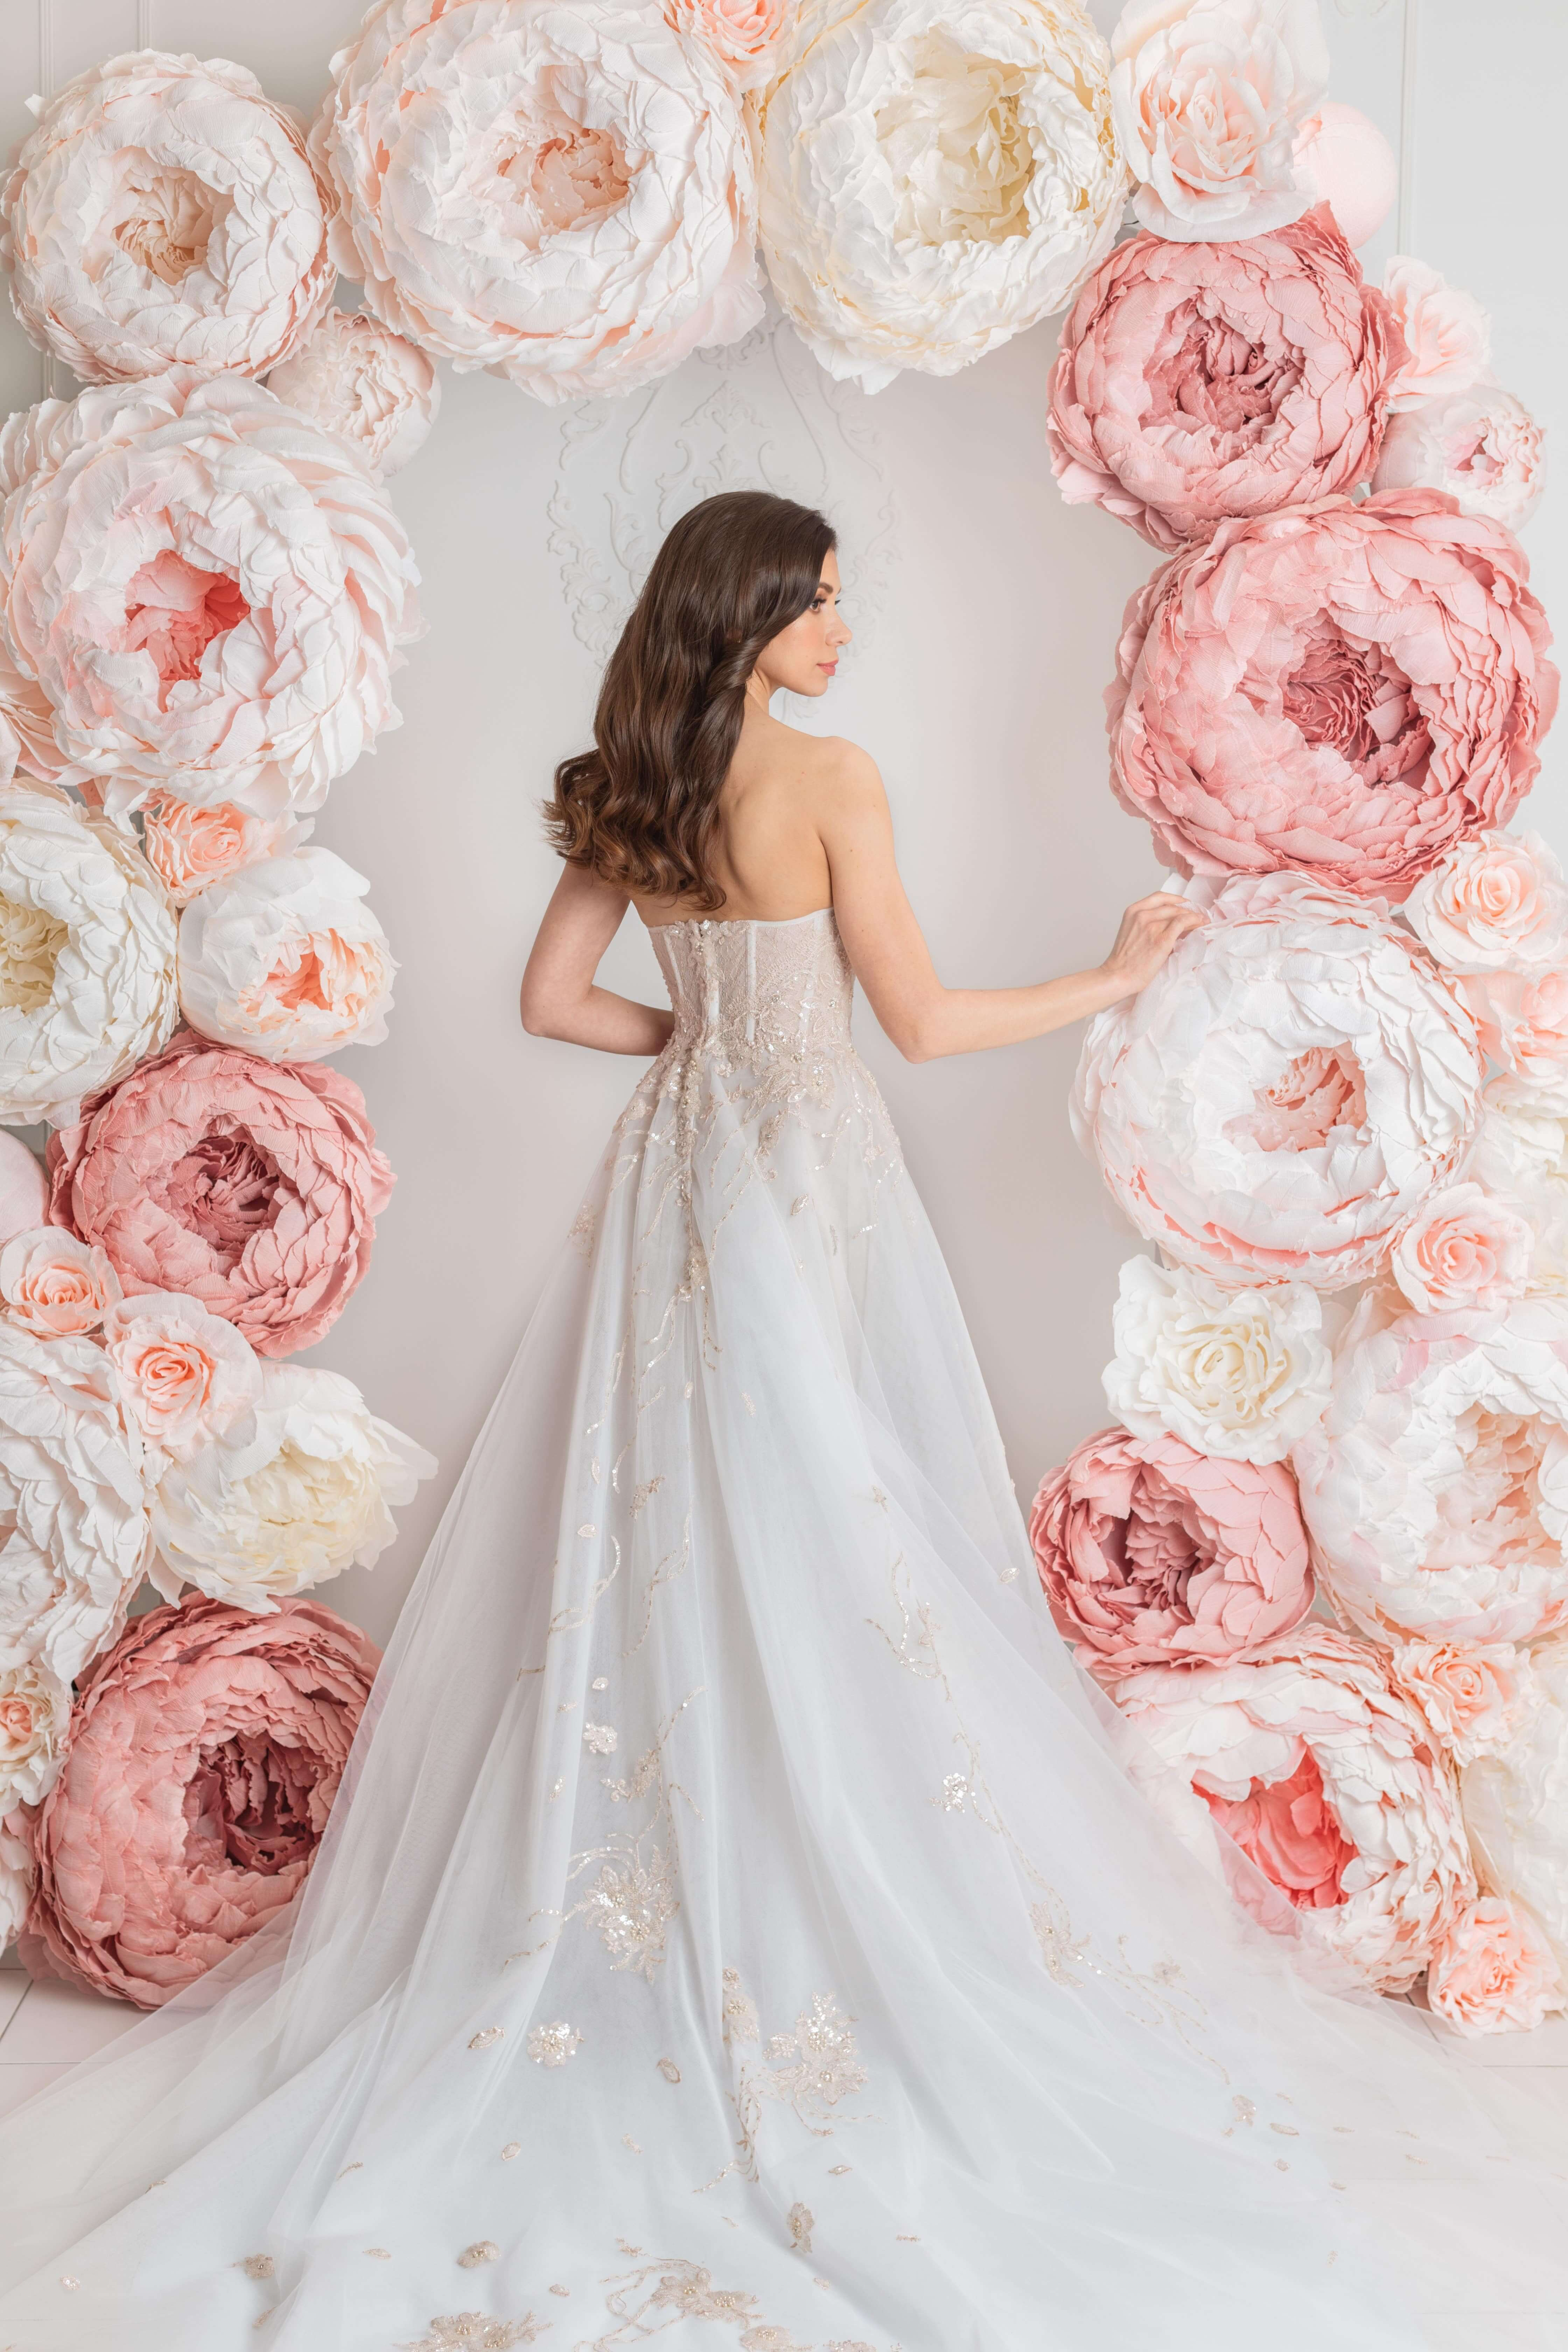 long train wedding dress lilia haute couture ornate back corset dress